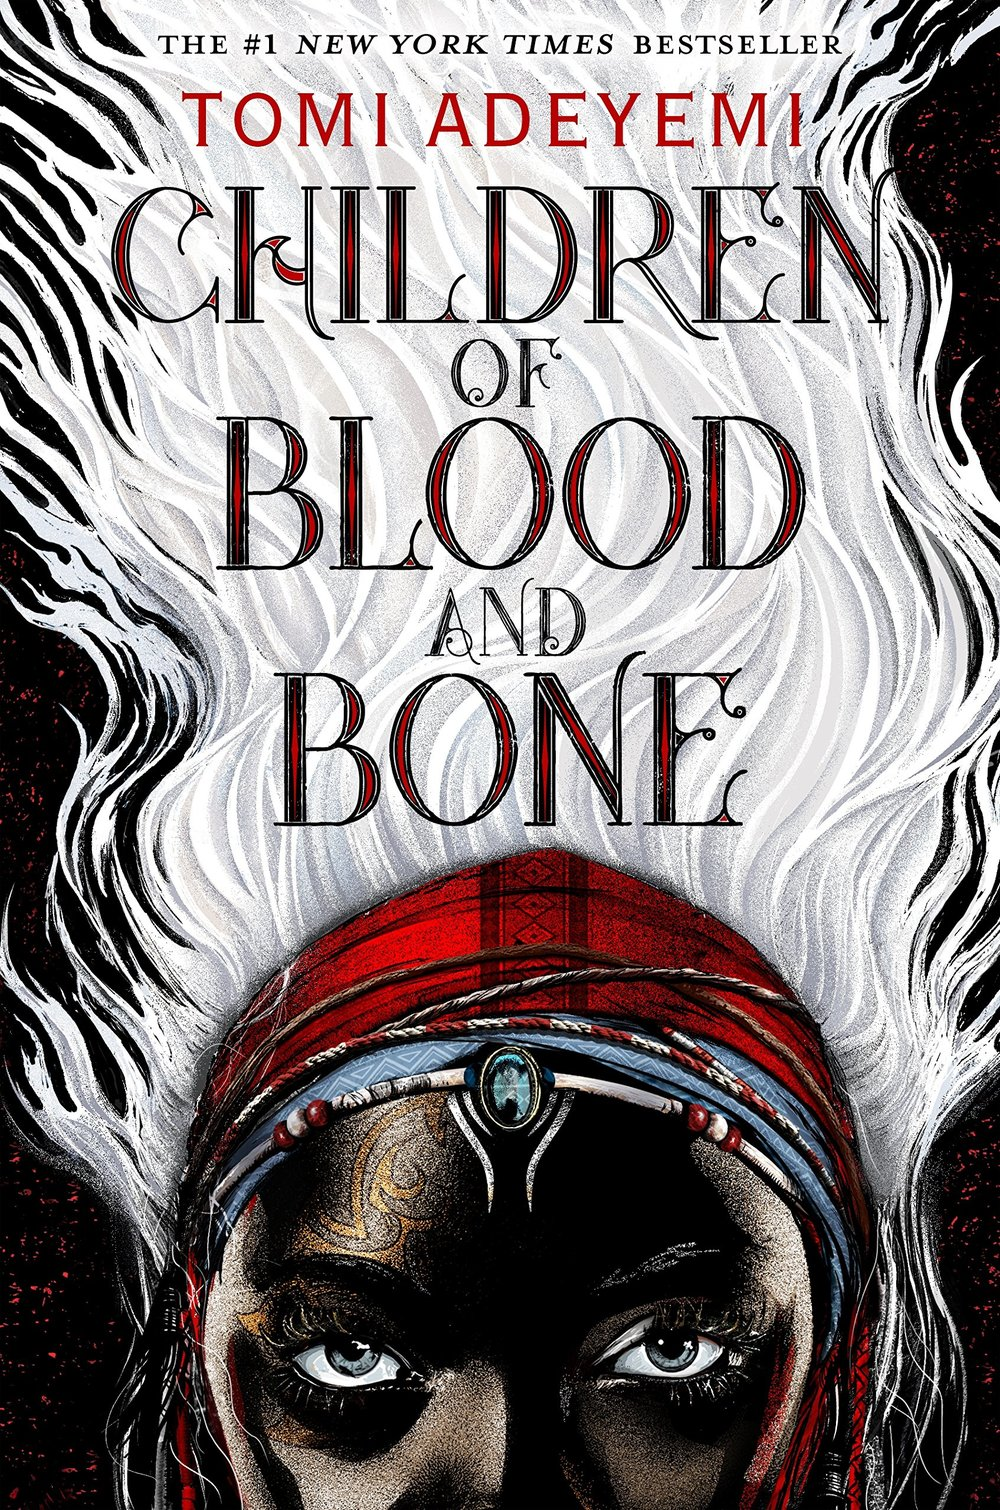 adeyemi-children-blood-bone.jpg